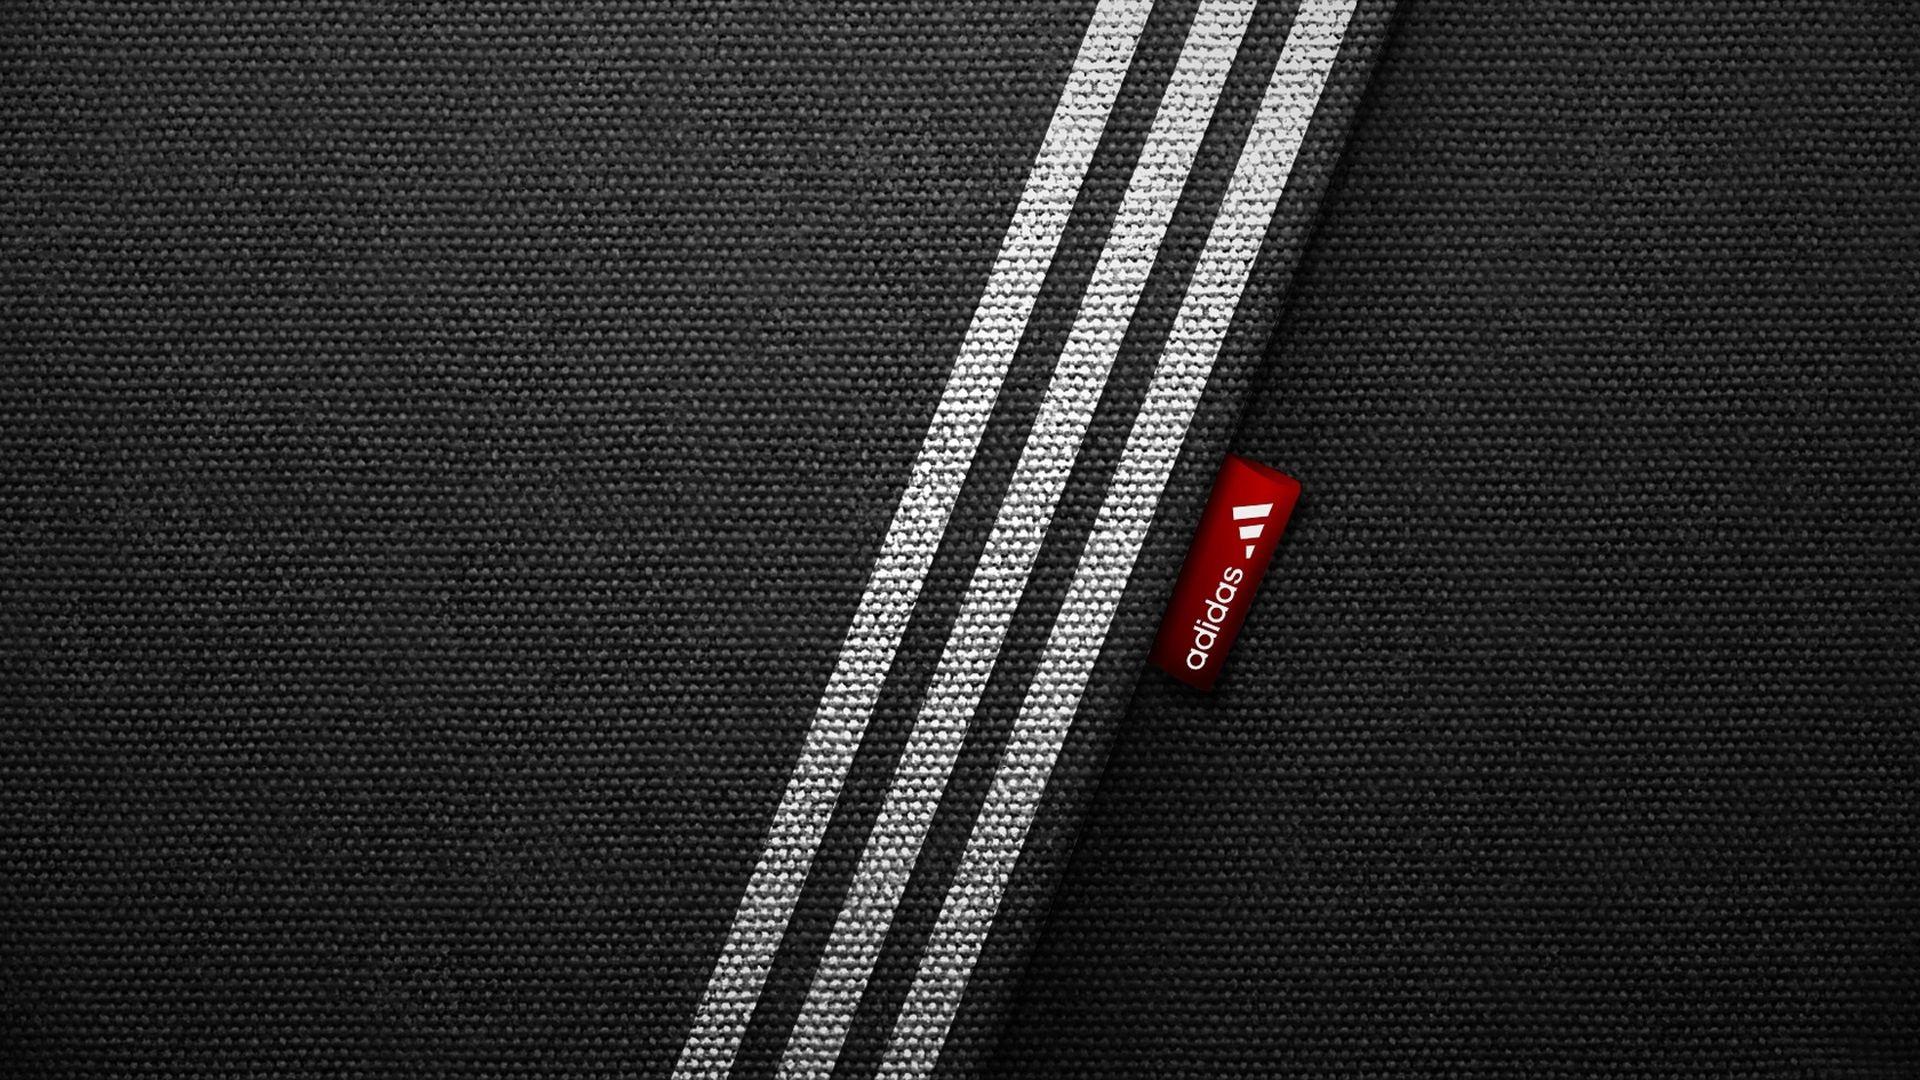 adidas iphone, adidas blue logo